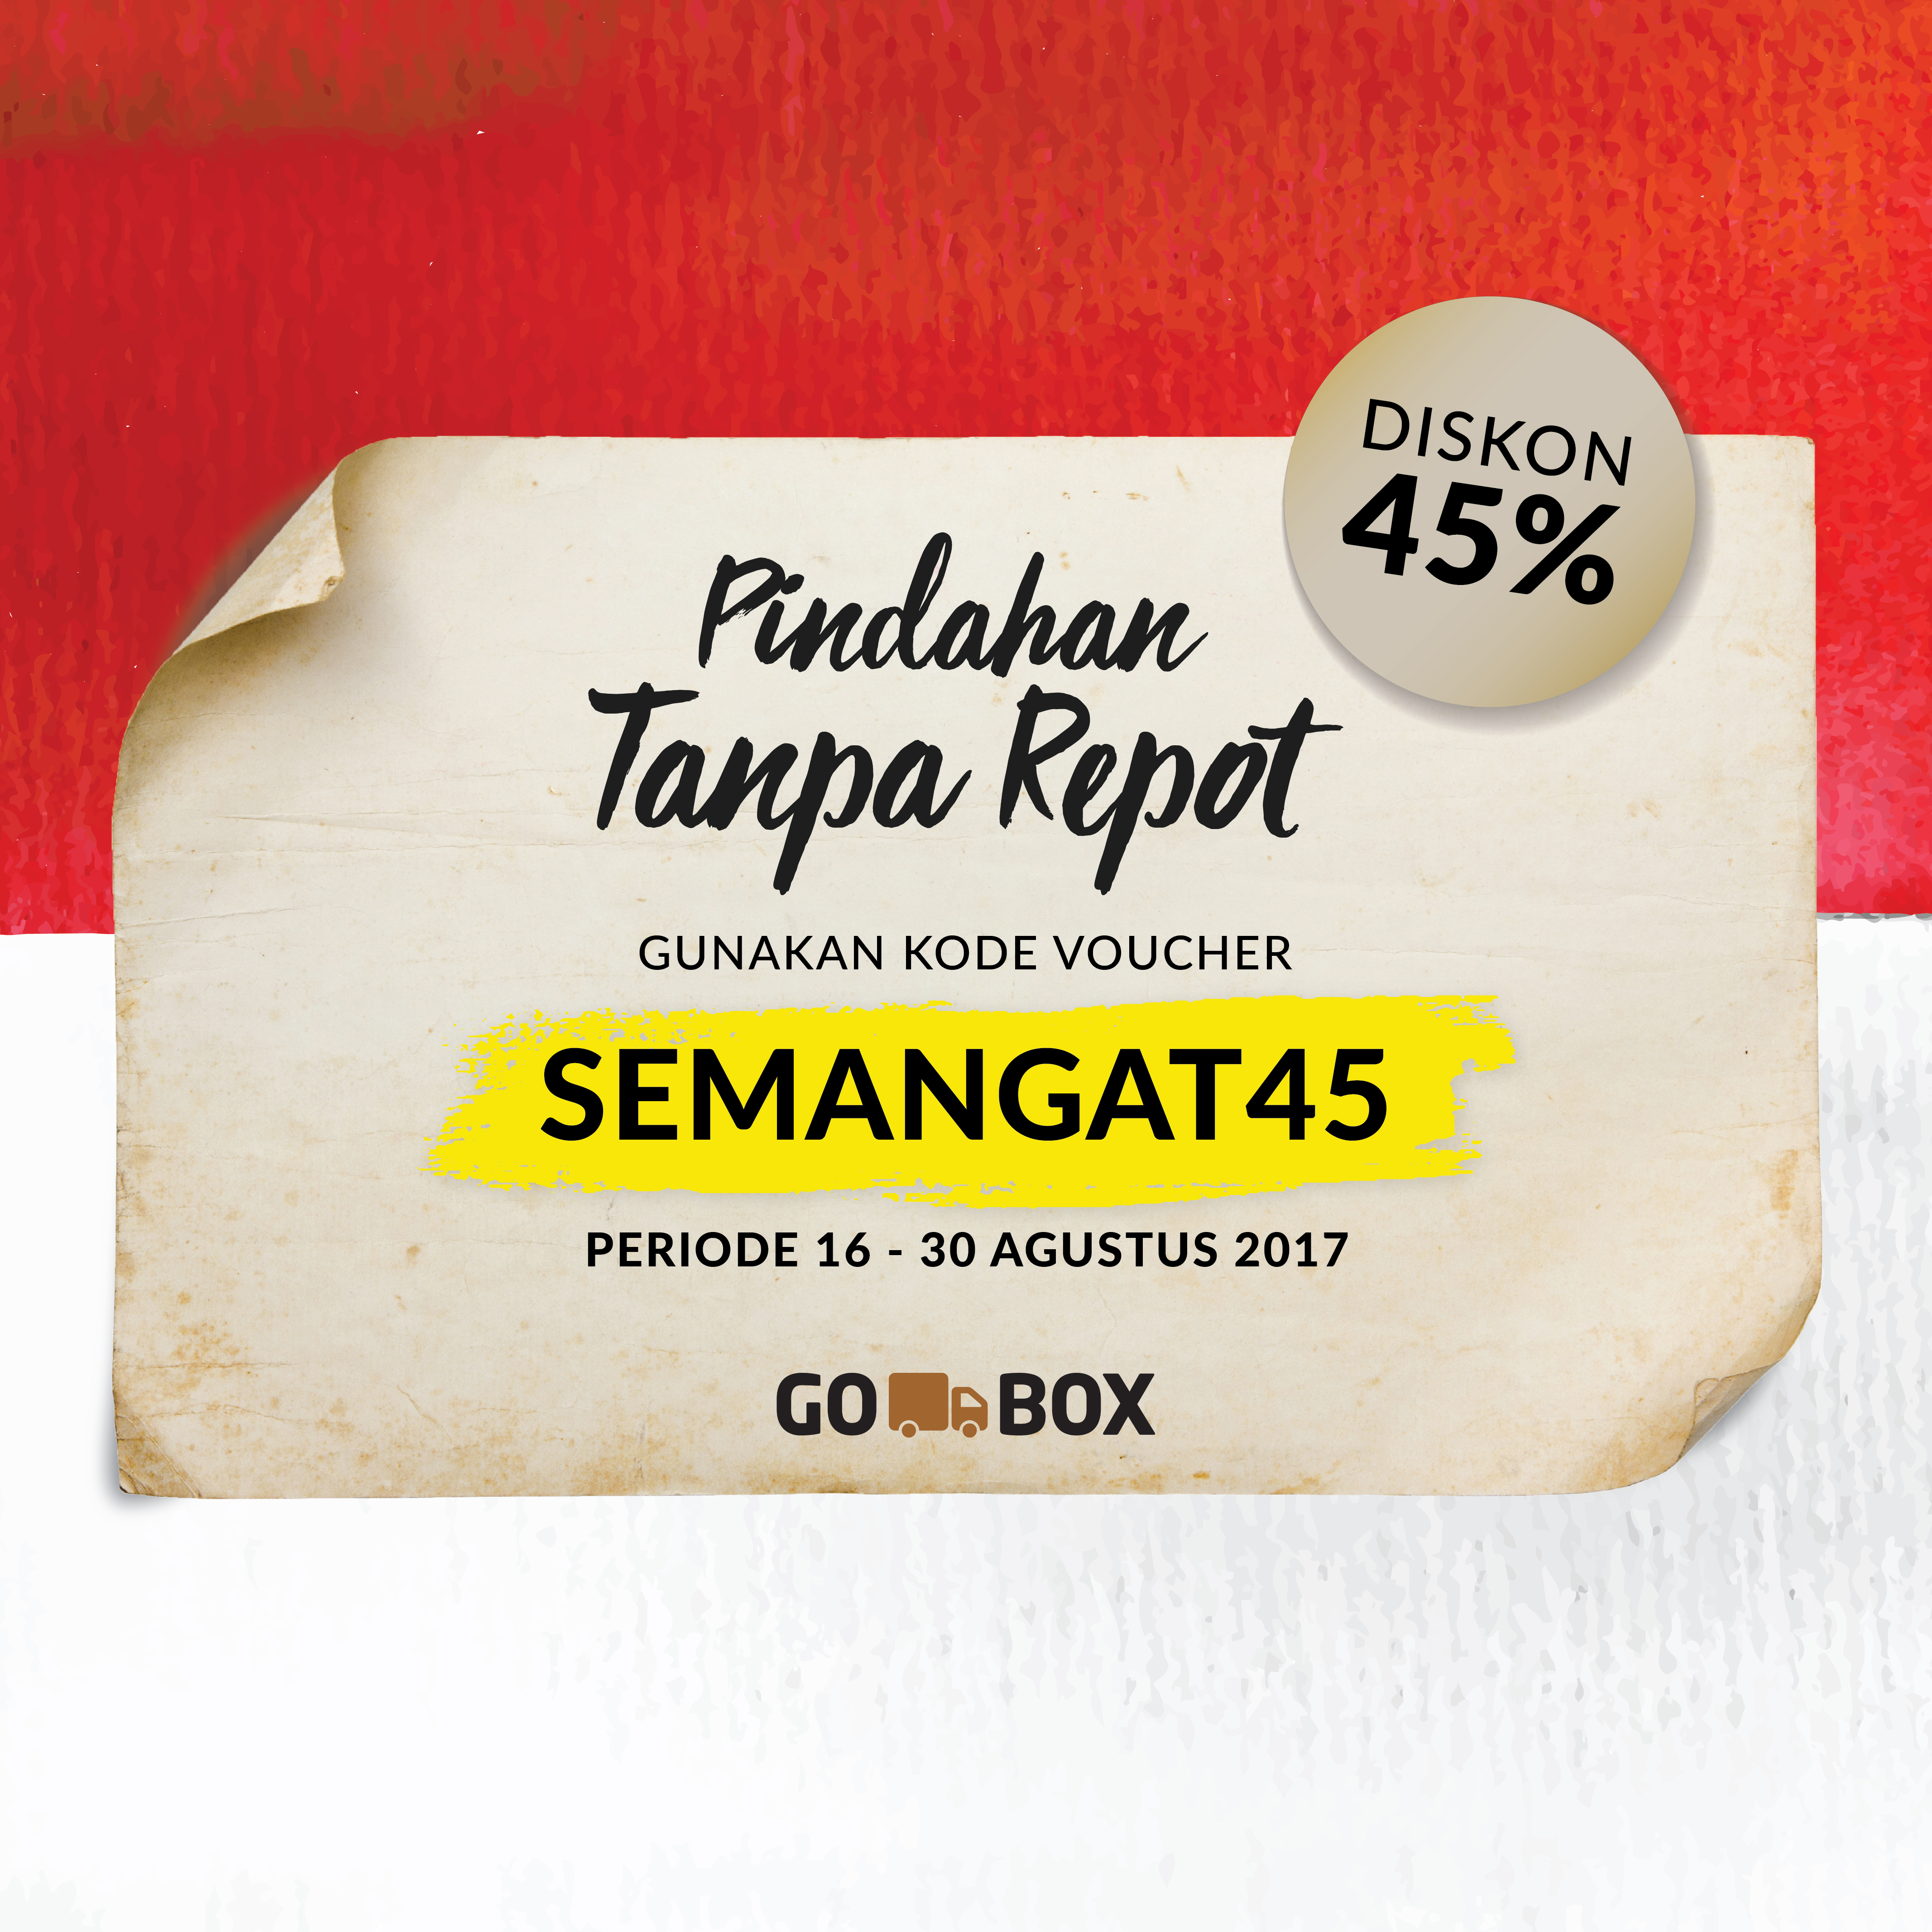 Jelang Kemerdekaan Indonesia, GO-BOX Dukung Pengusaha Lokal